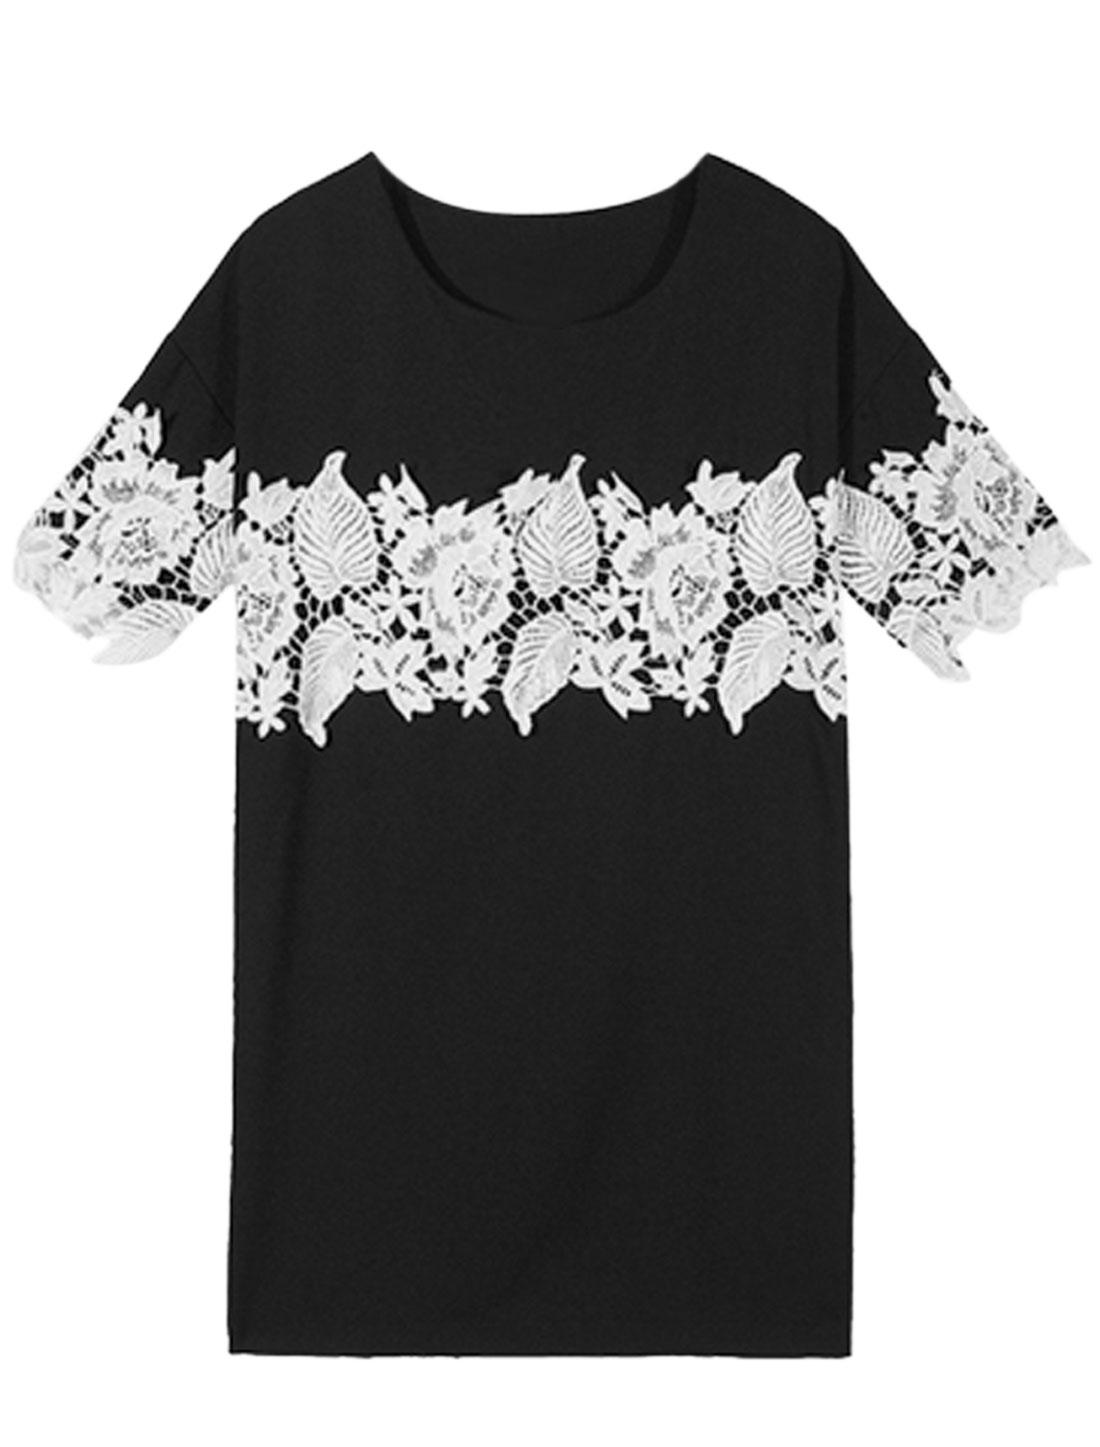 Women Round Neck Short Sleeves Crochet T Shirt Dress Black XS